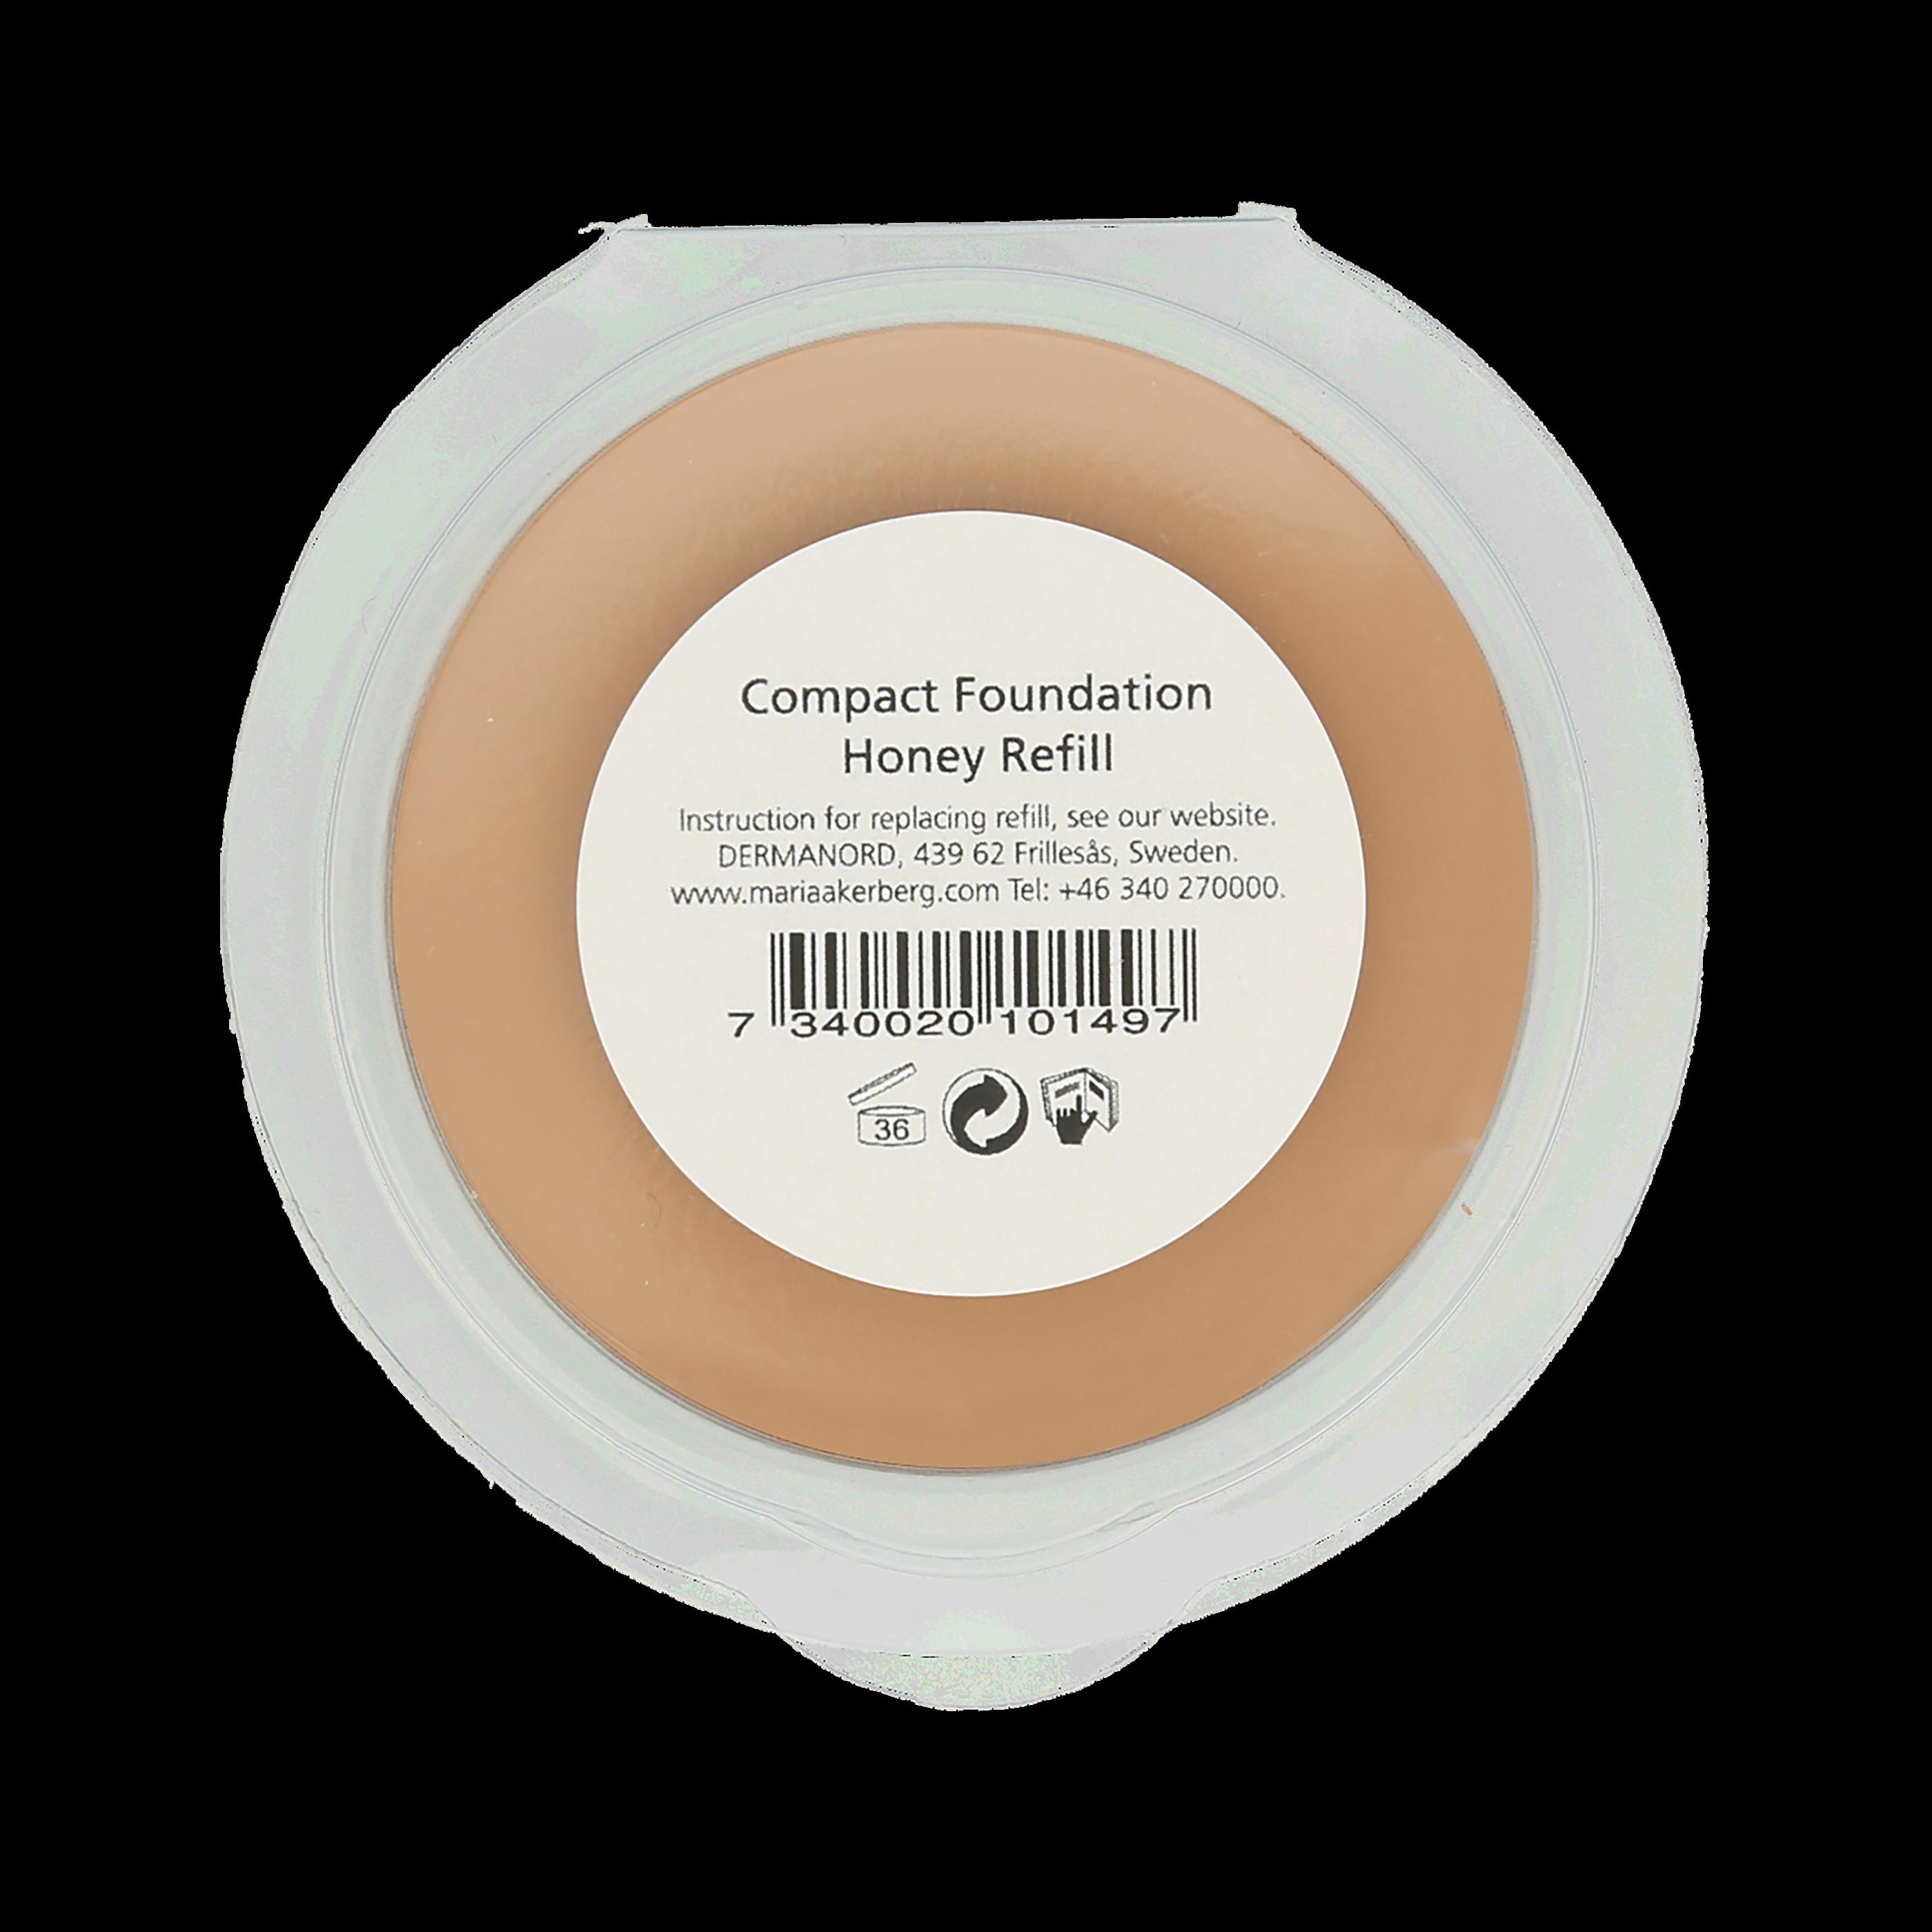 Compact Foundation Honey Refill